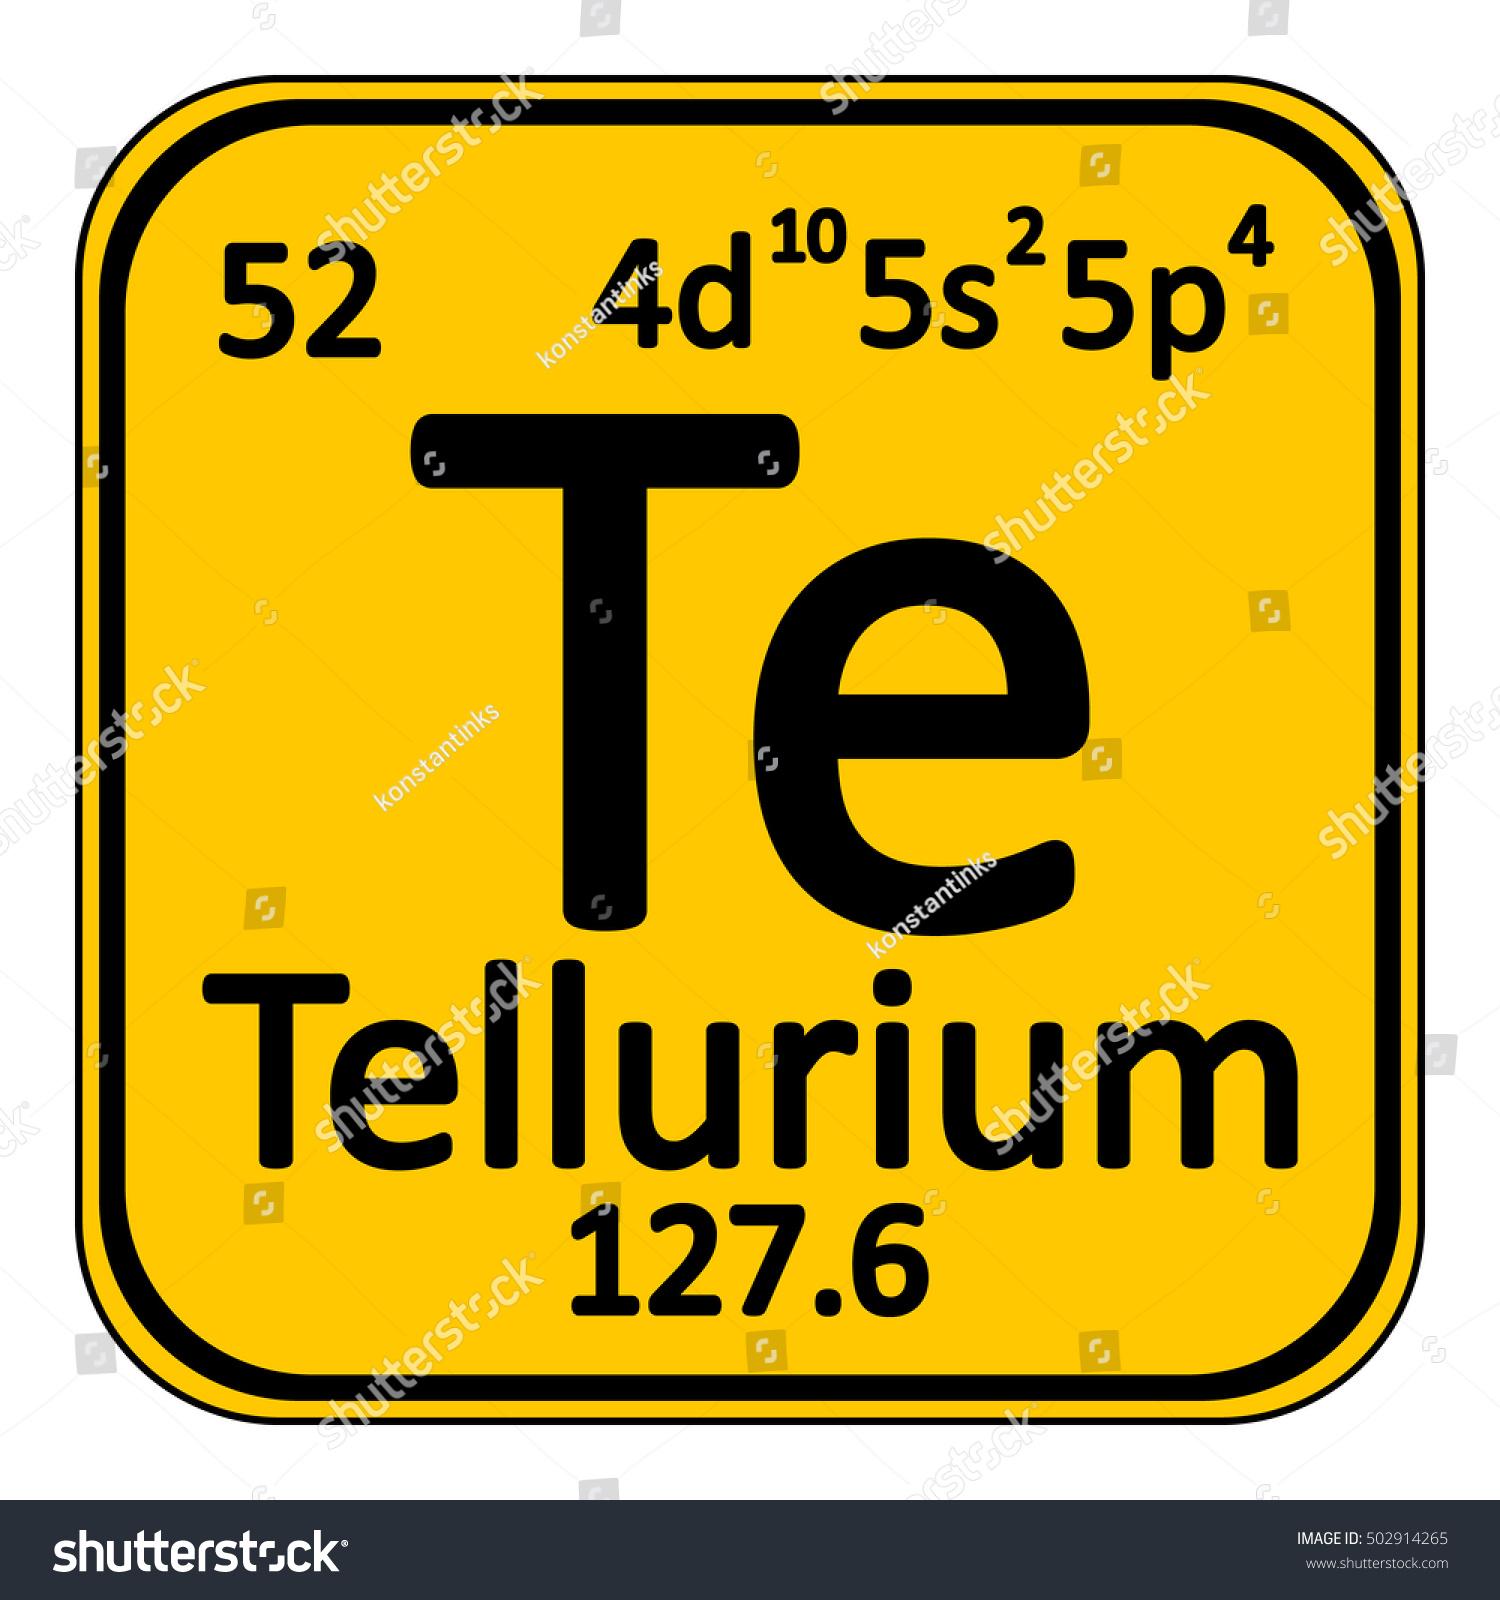 26th element periodic table images periodic table images ba symbol periodic table gallery periodic table images ba element periodic table images periodic table images gamestrikefo Image collections